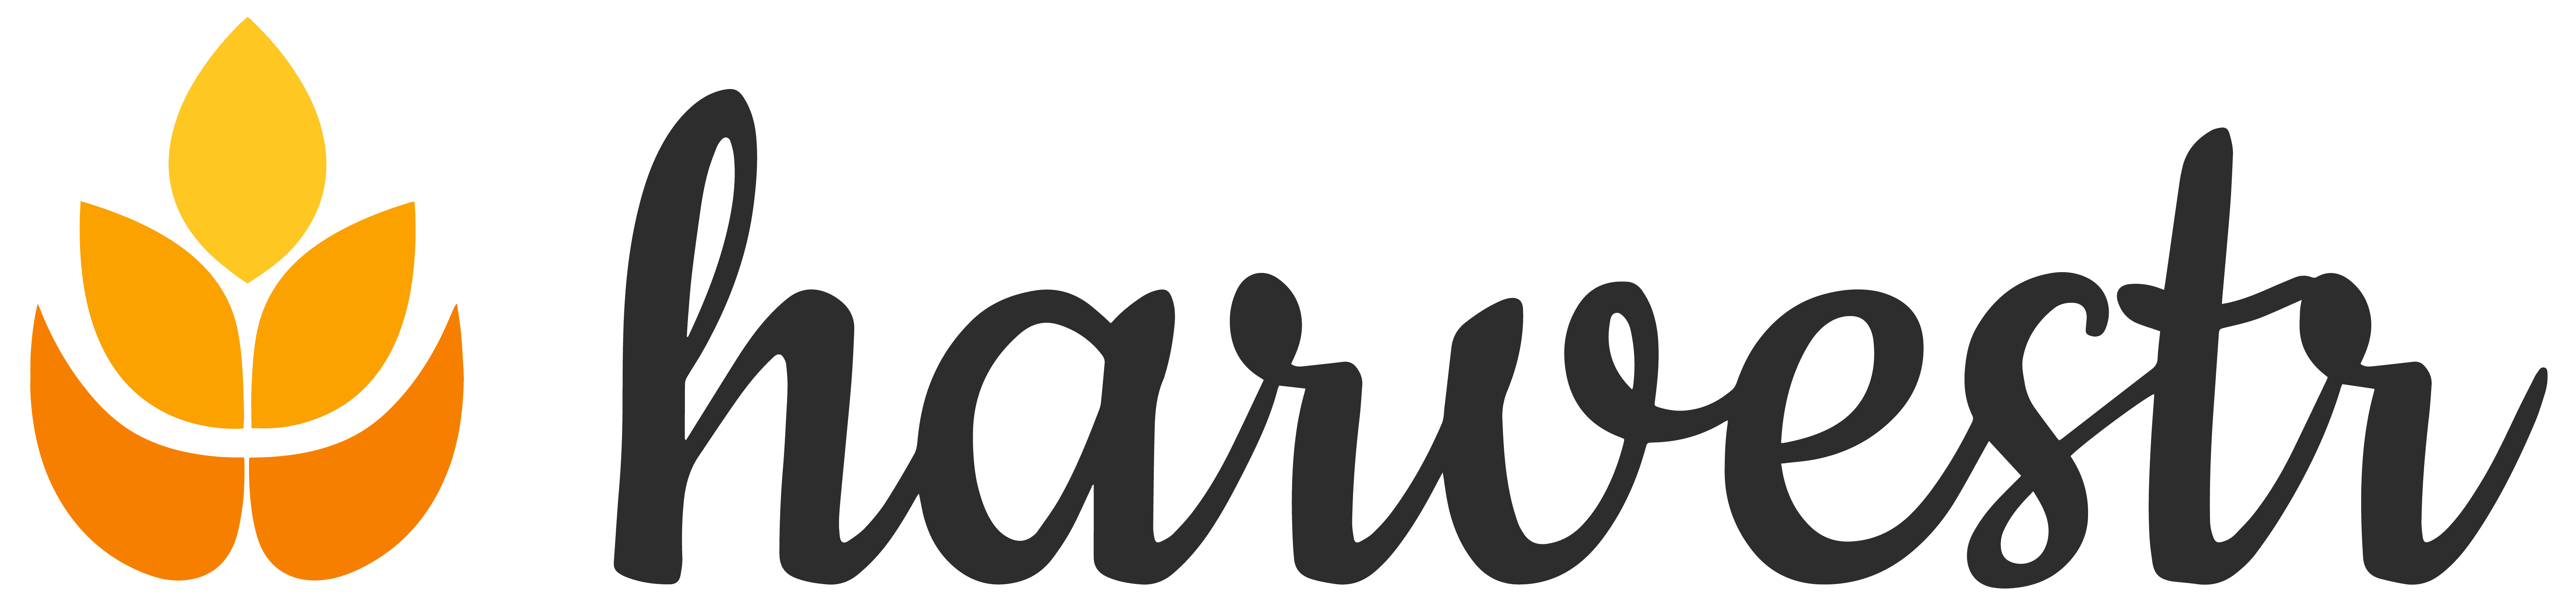 Harvestr Coupon & Startup Discount